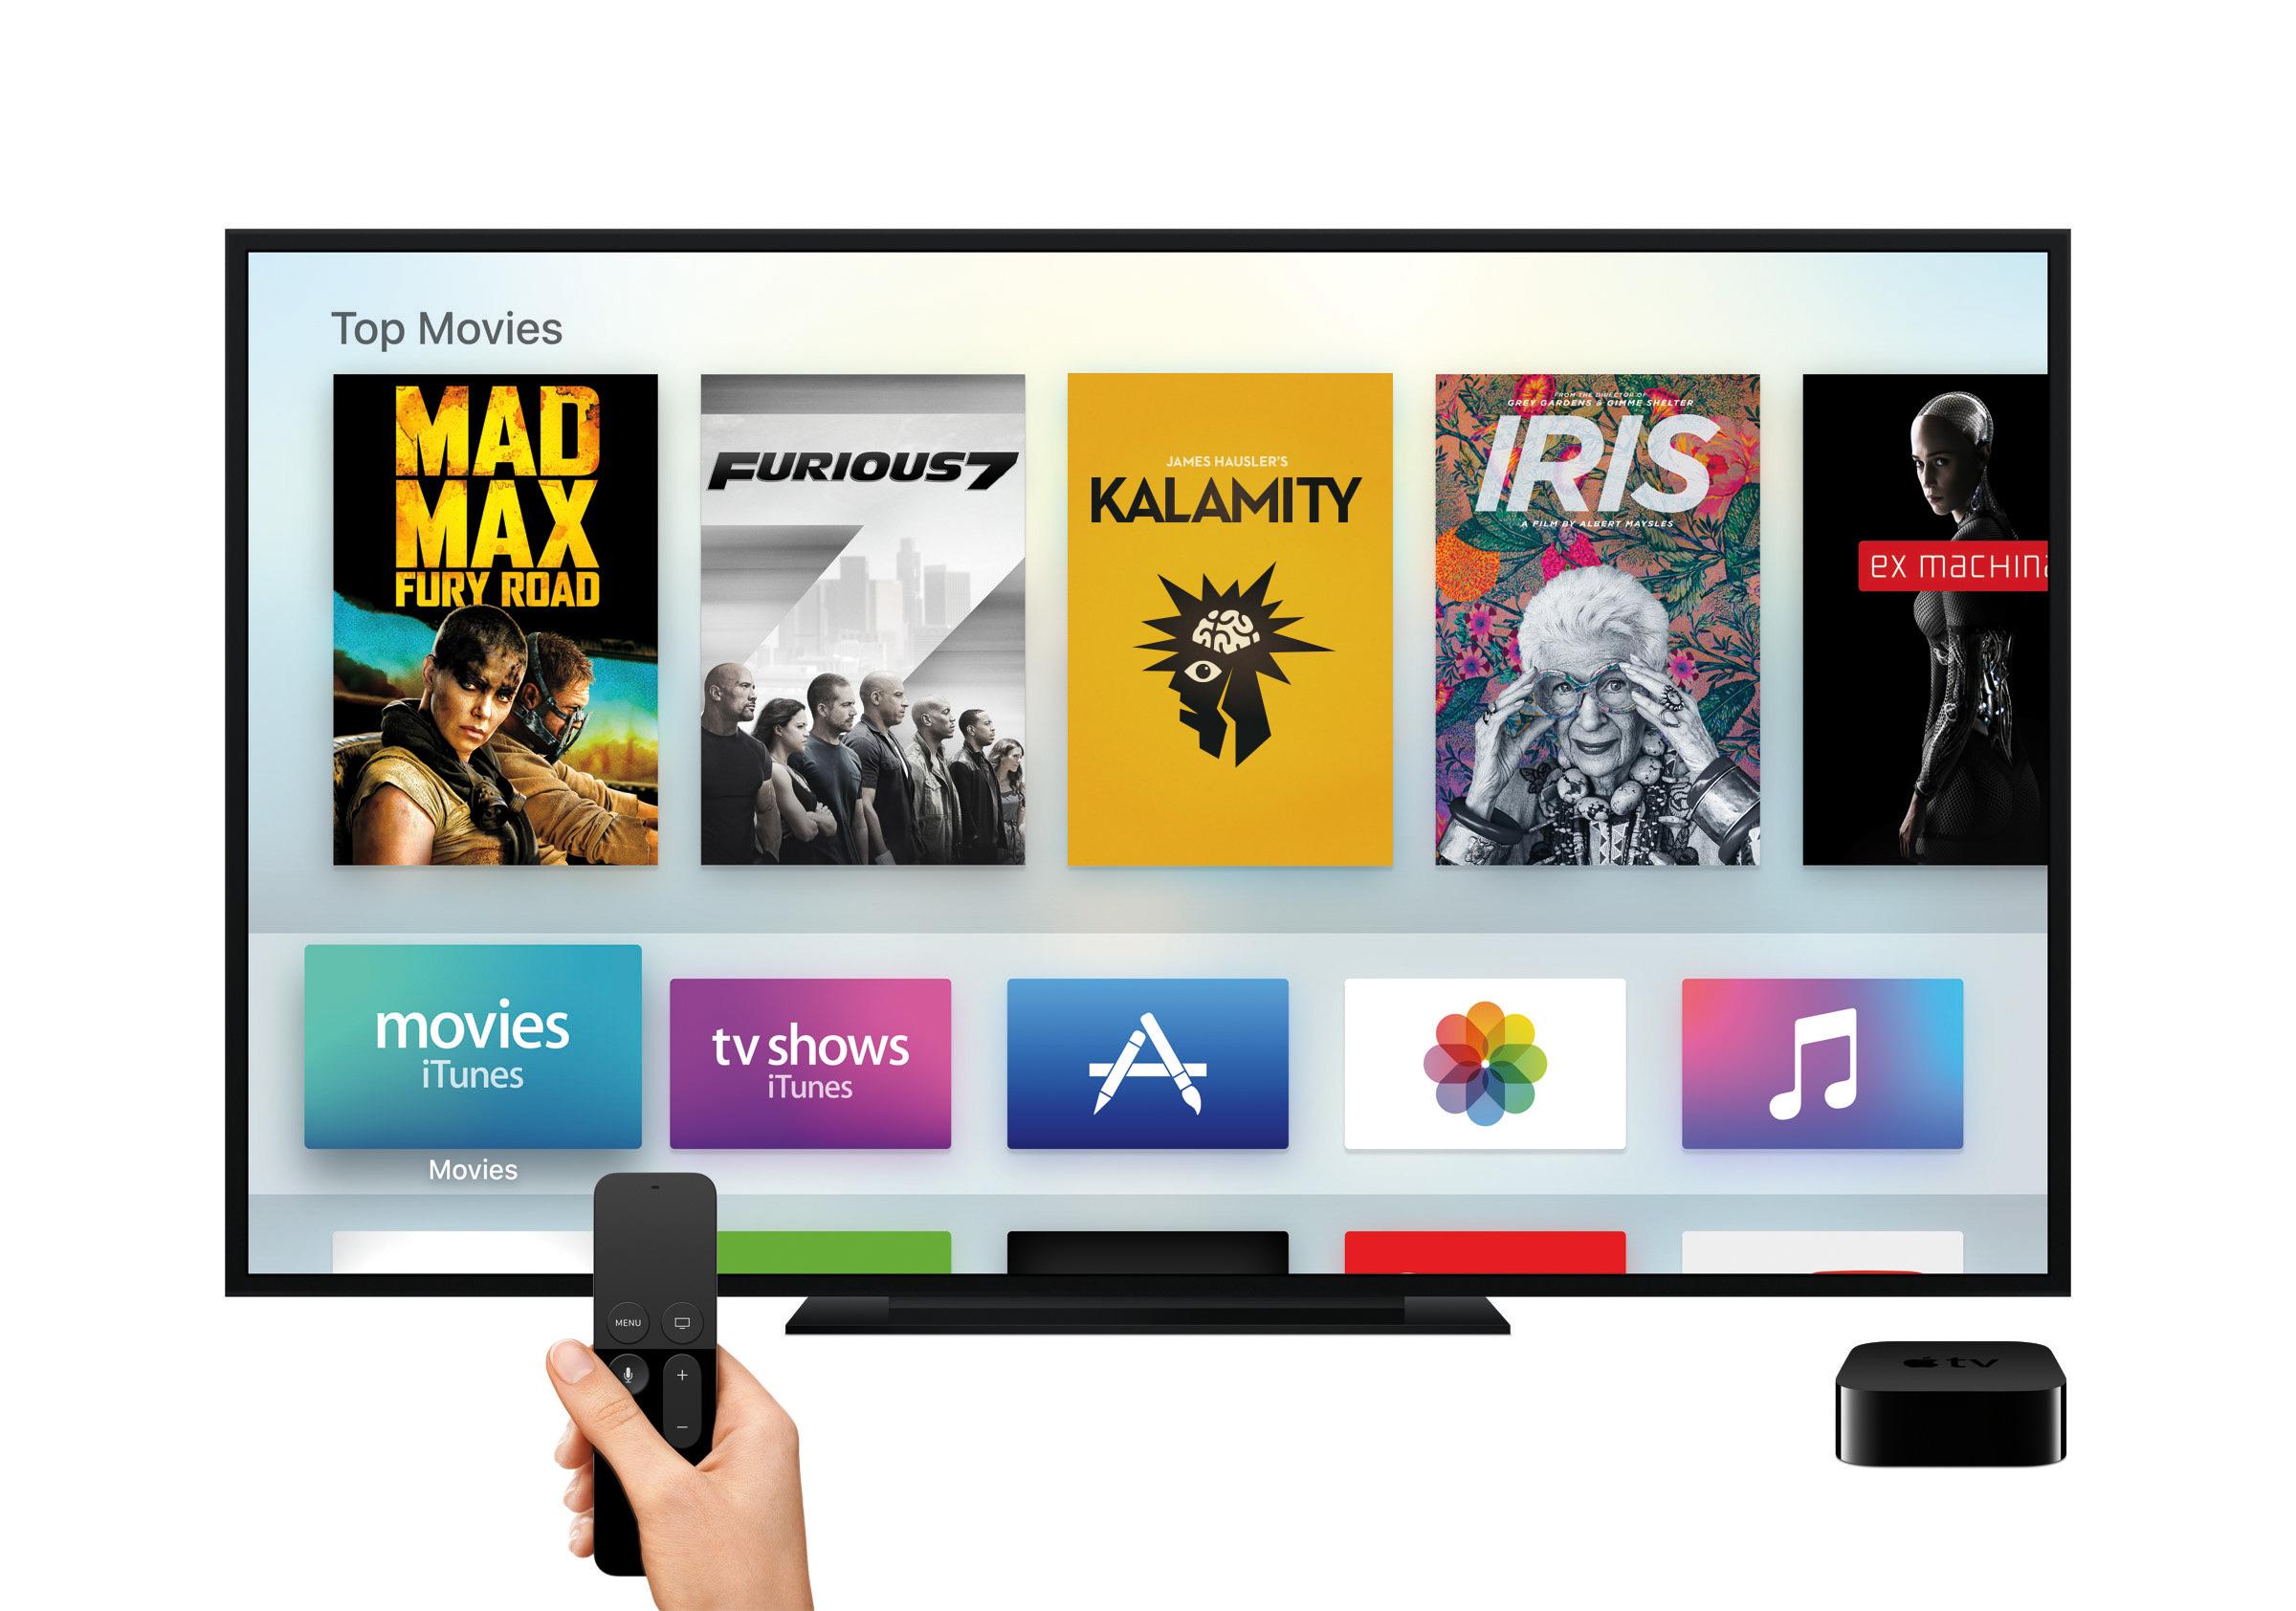 apple-tv-selection-screen02.jpg